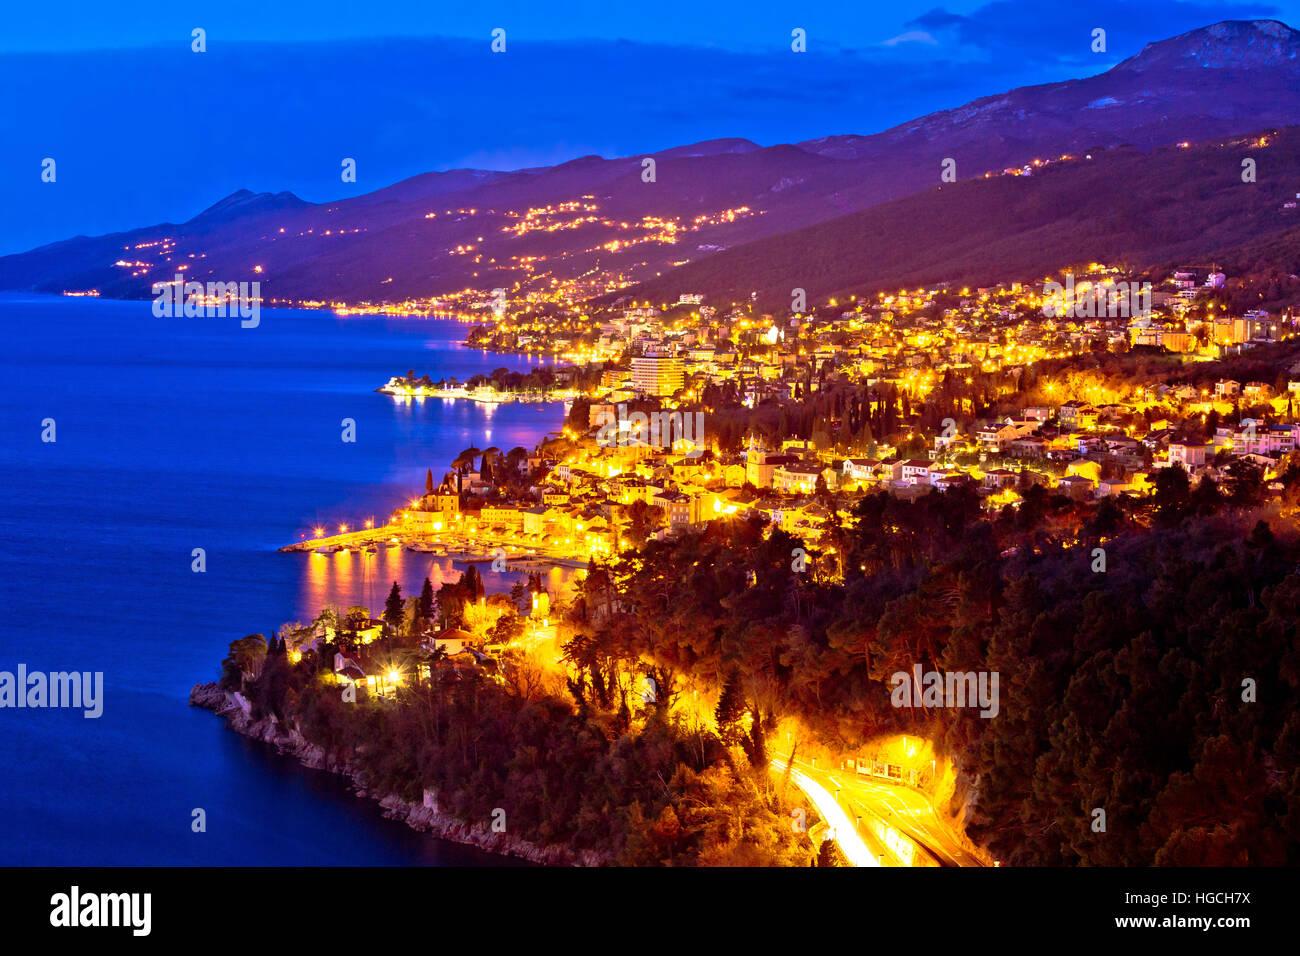 Opatija riviera bay evening view, Kvarner region of Croatia - Stock Image